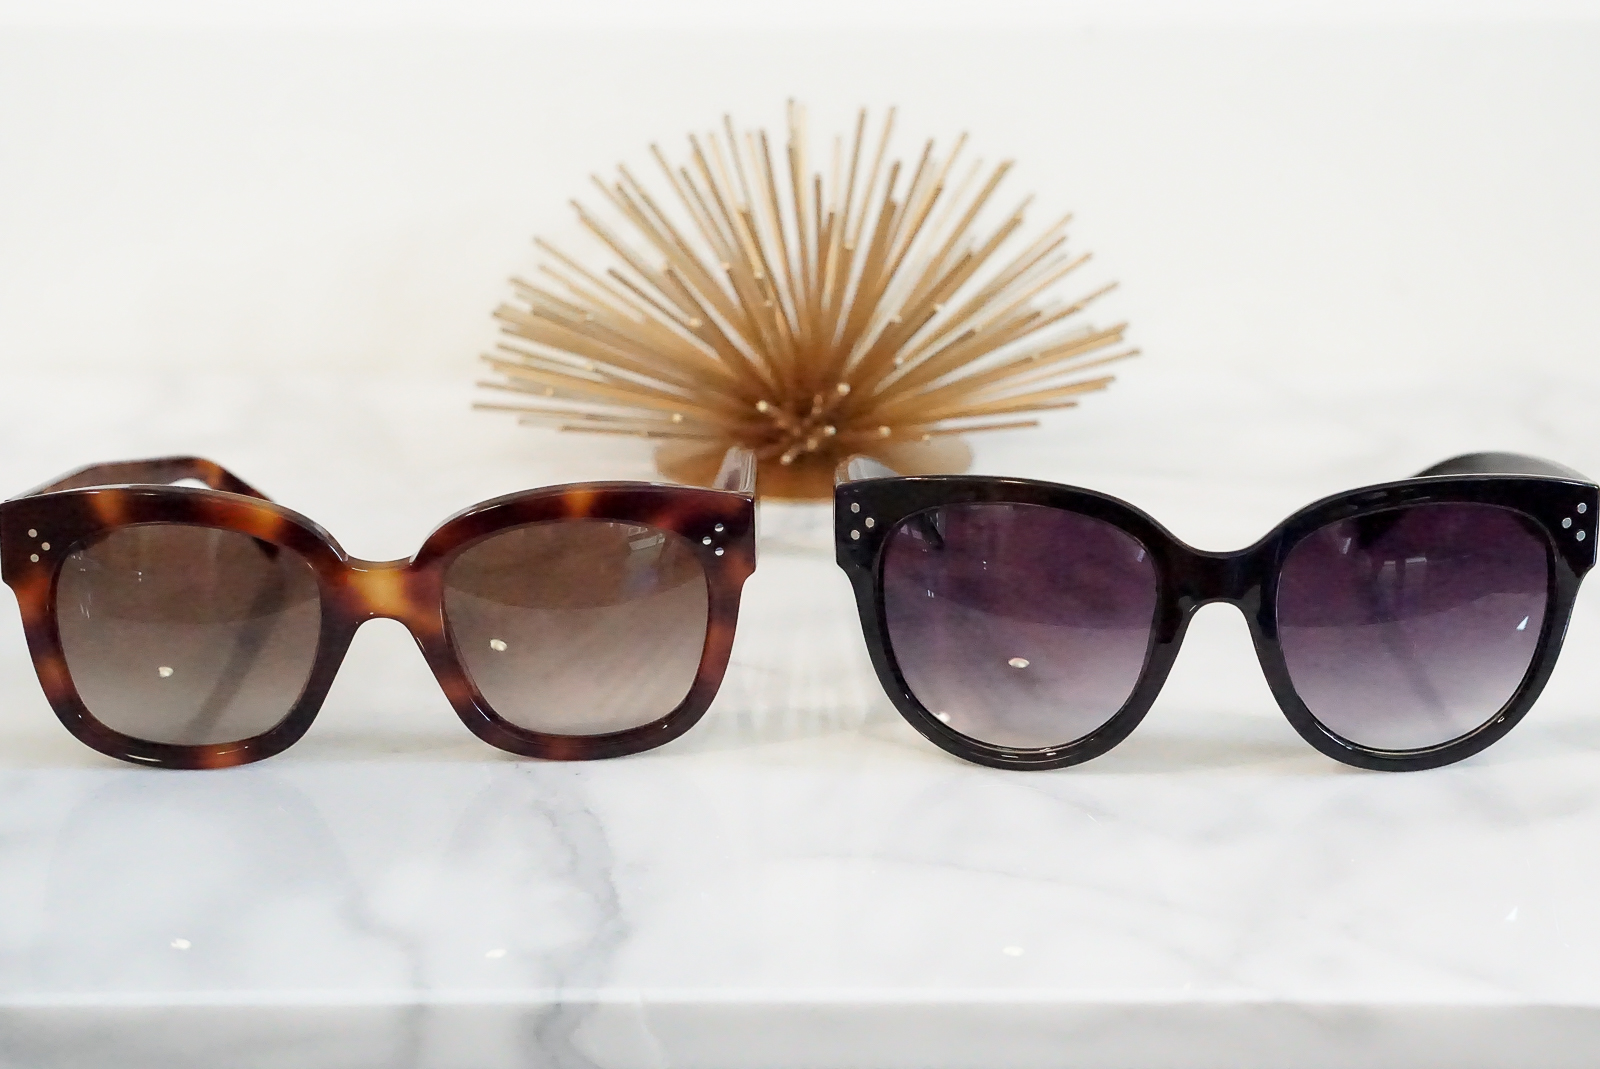 Celine Audrey Sunglasses, UV Zero sunglasses, Celine Audrey New, sunglasses similar to celine audrey, celine audrey sunglasses replica, celine audrey sunglasses dupe